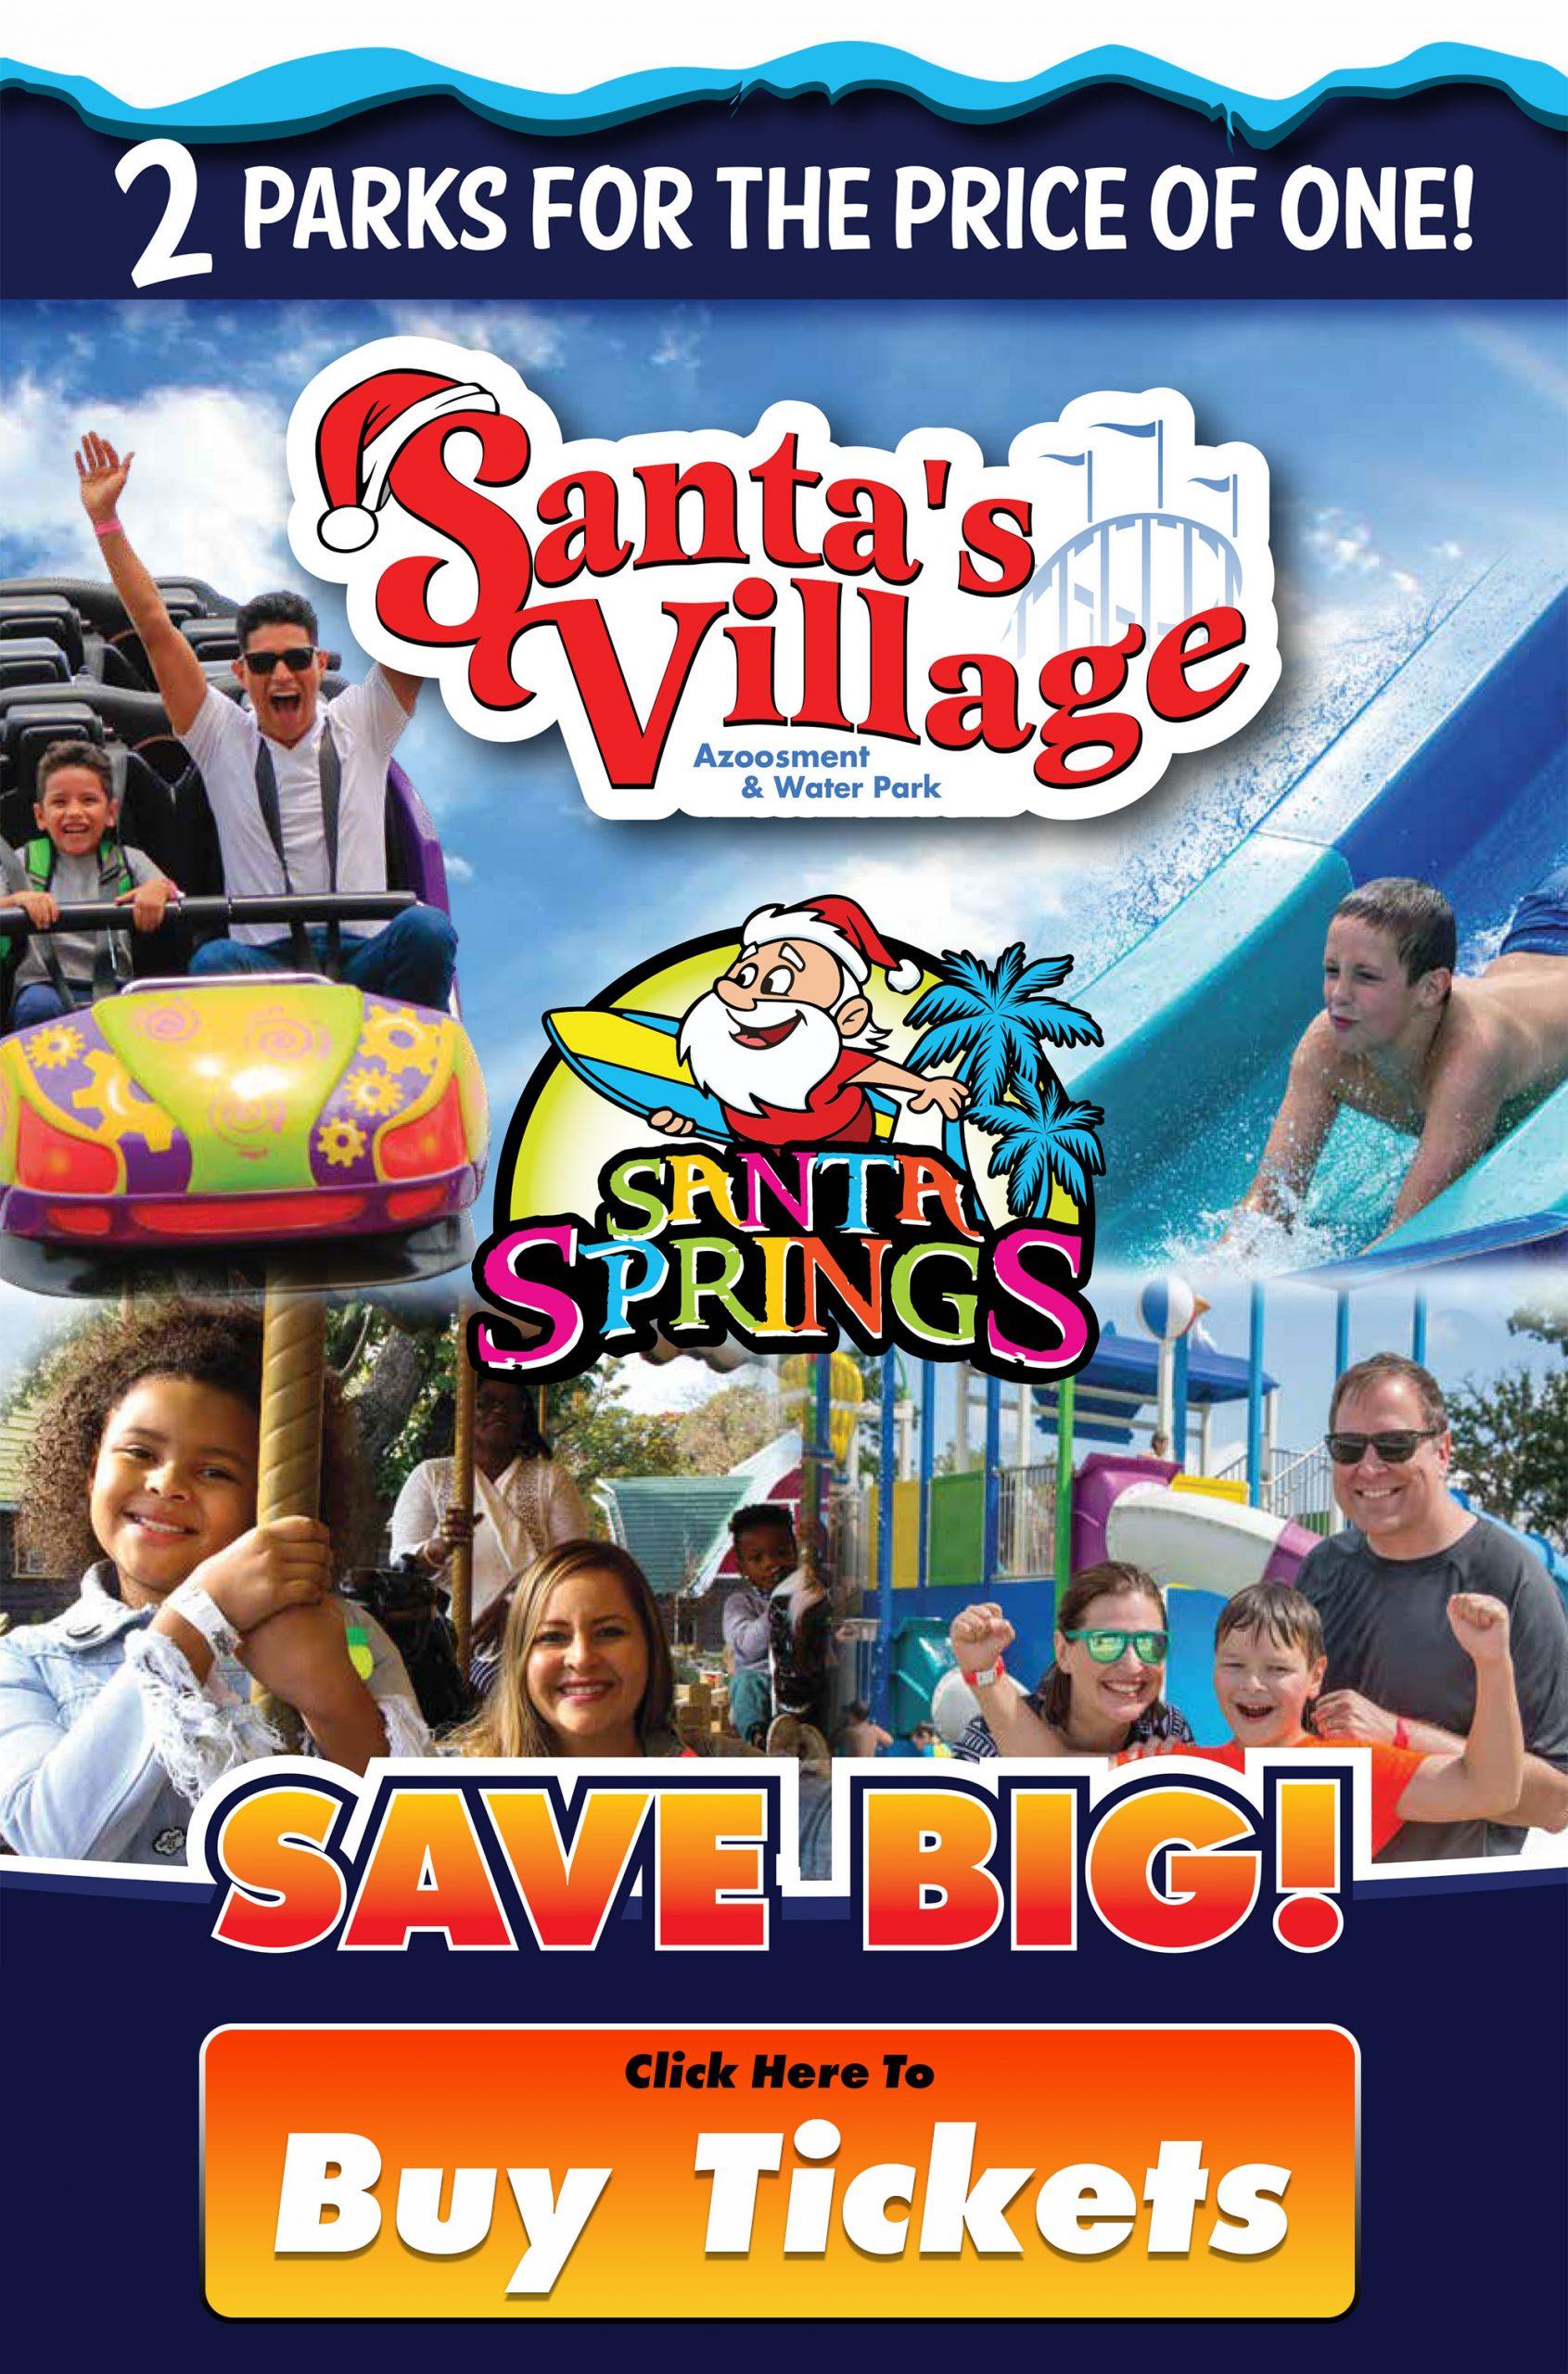 Santa's Village eTix Discount Image